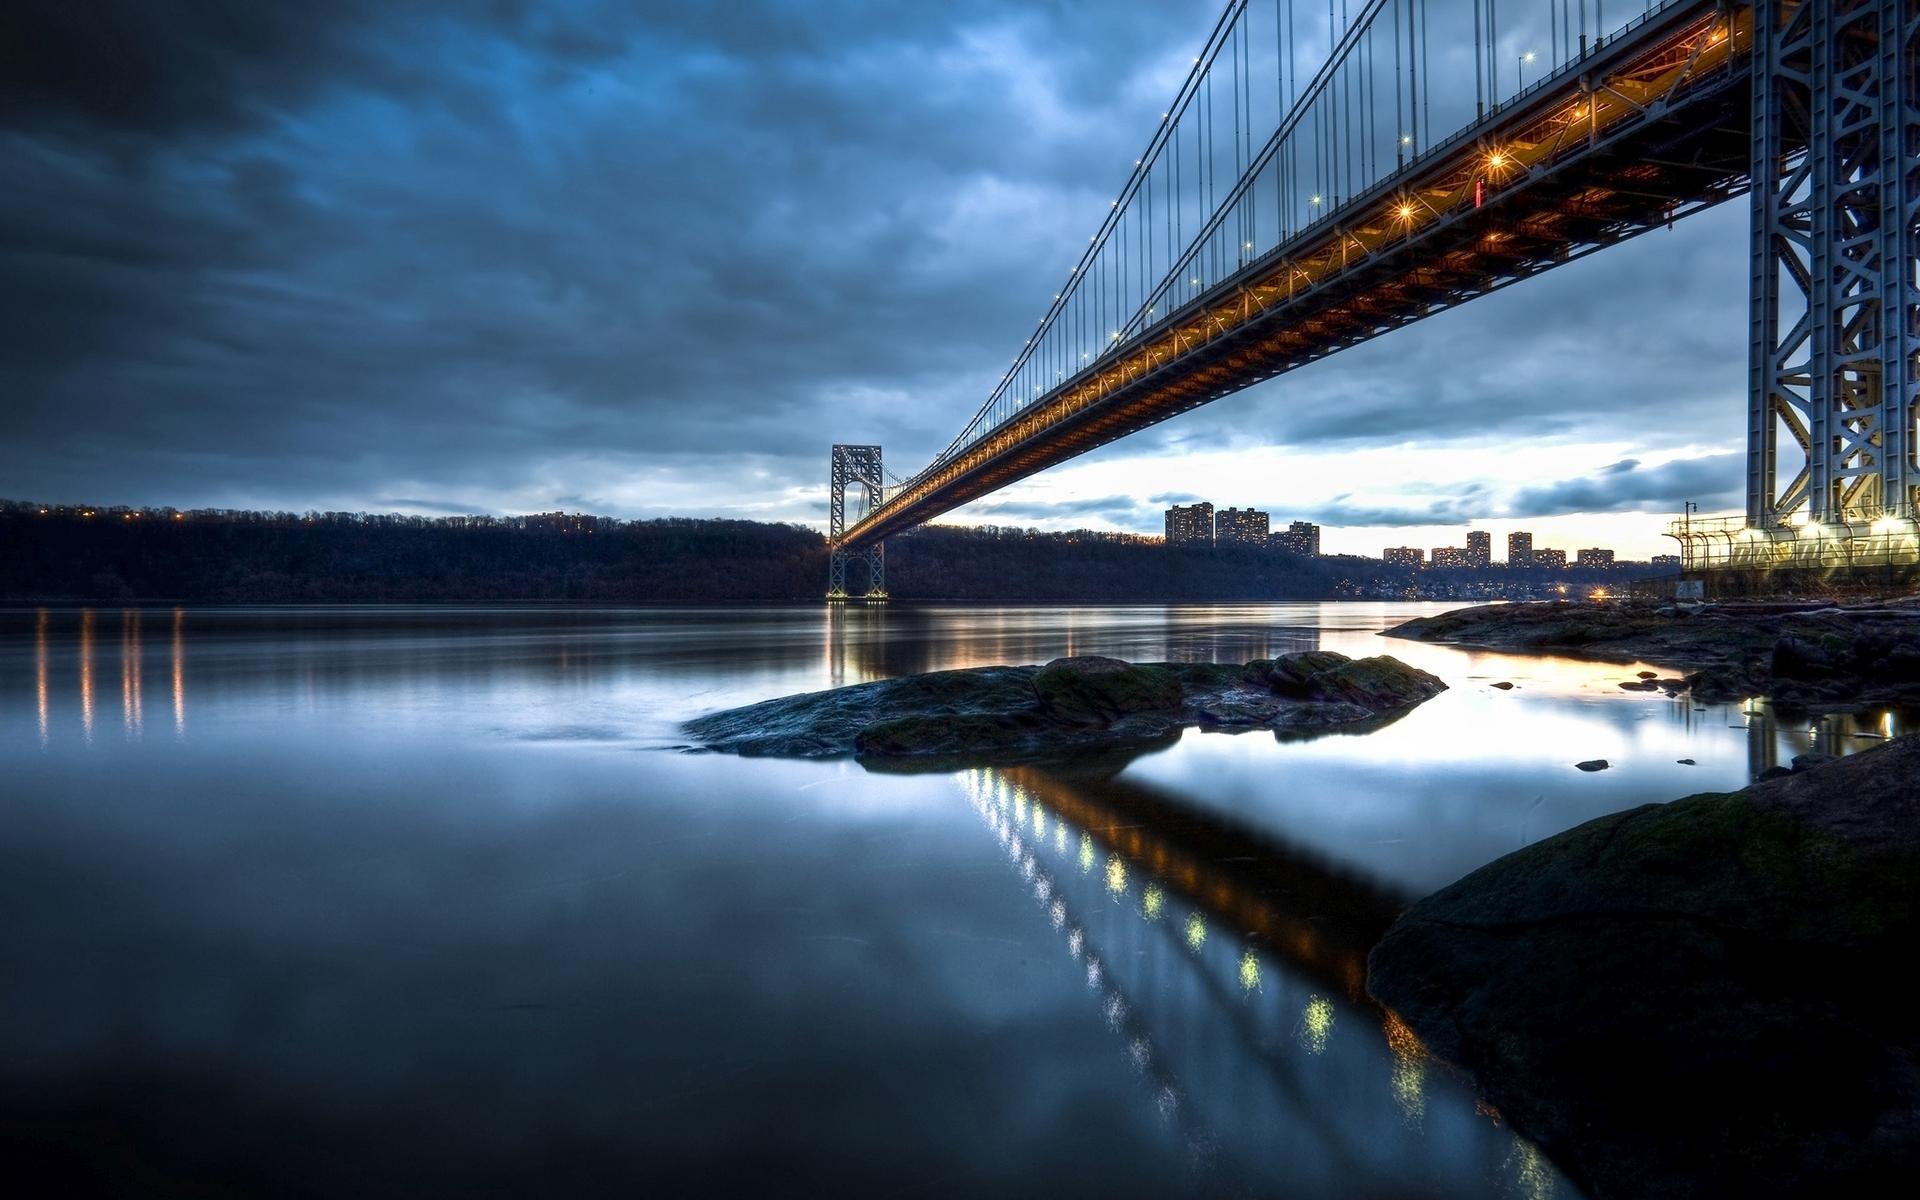 Download George Washington Bridge wallpaper 26573 [1920x1200] 46 1920x1200